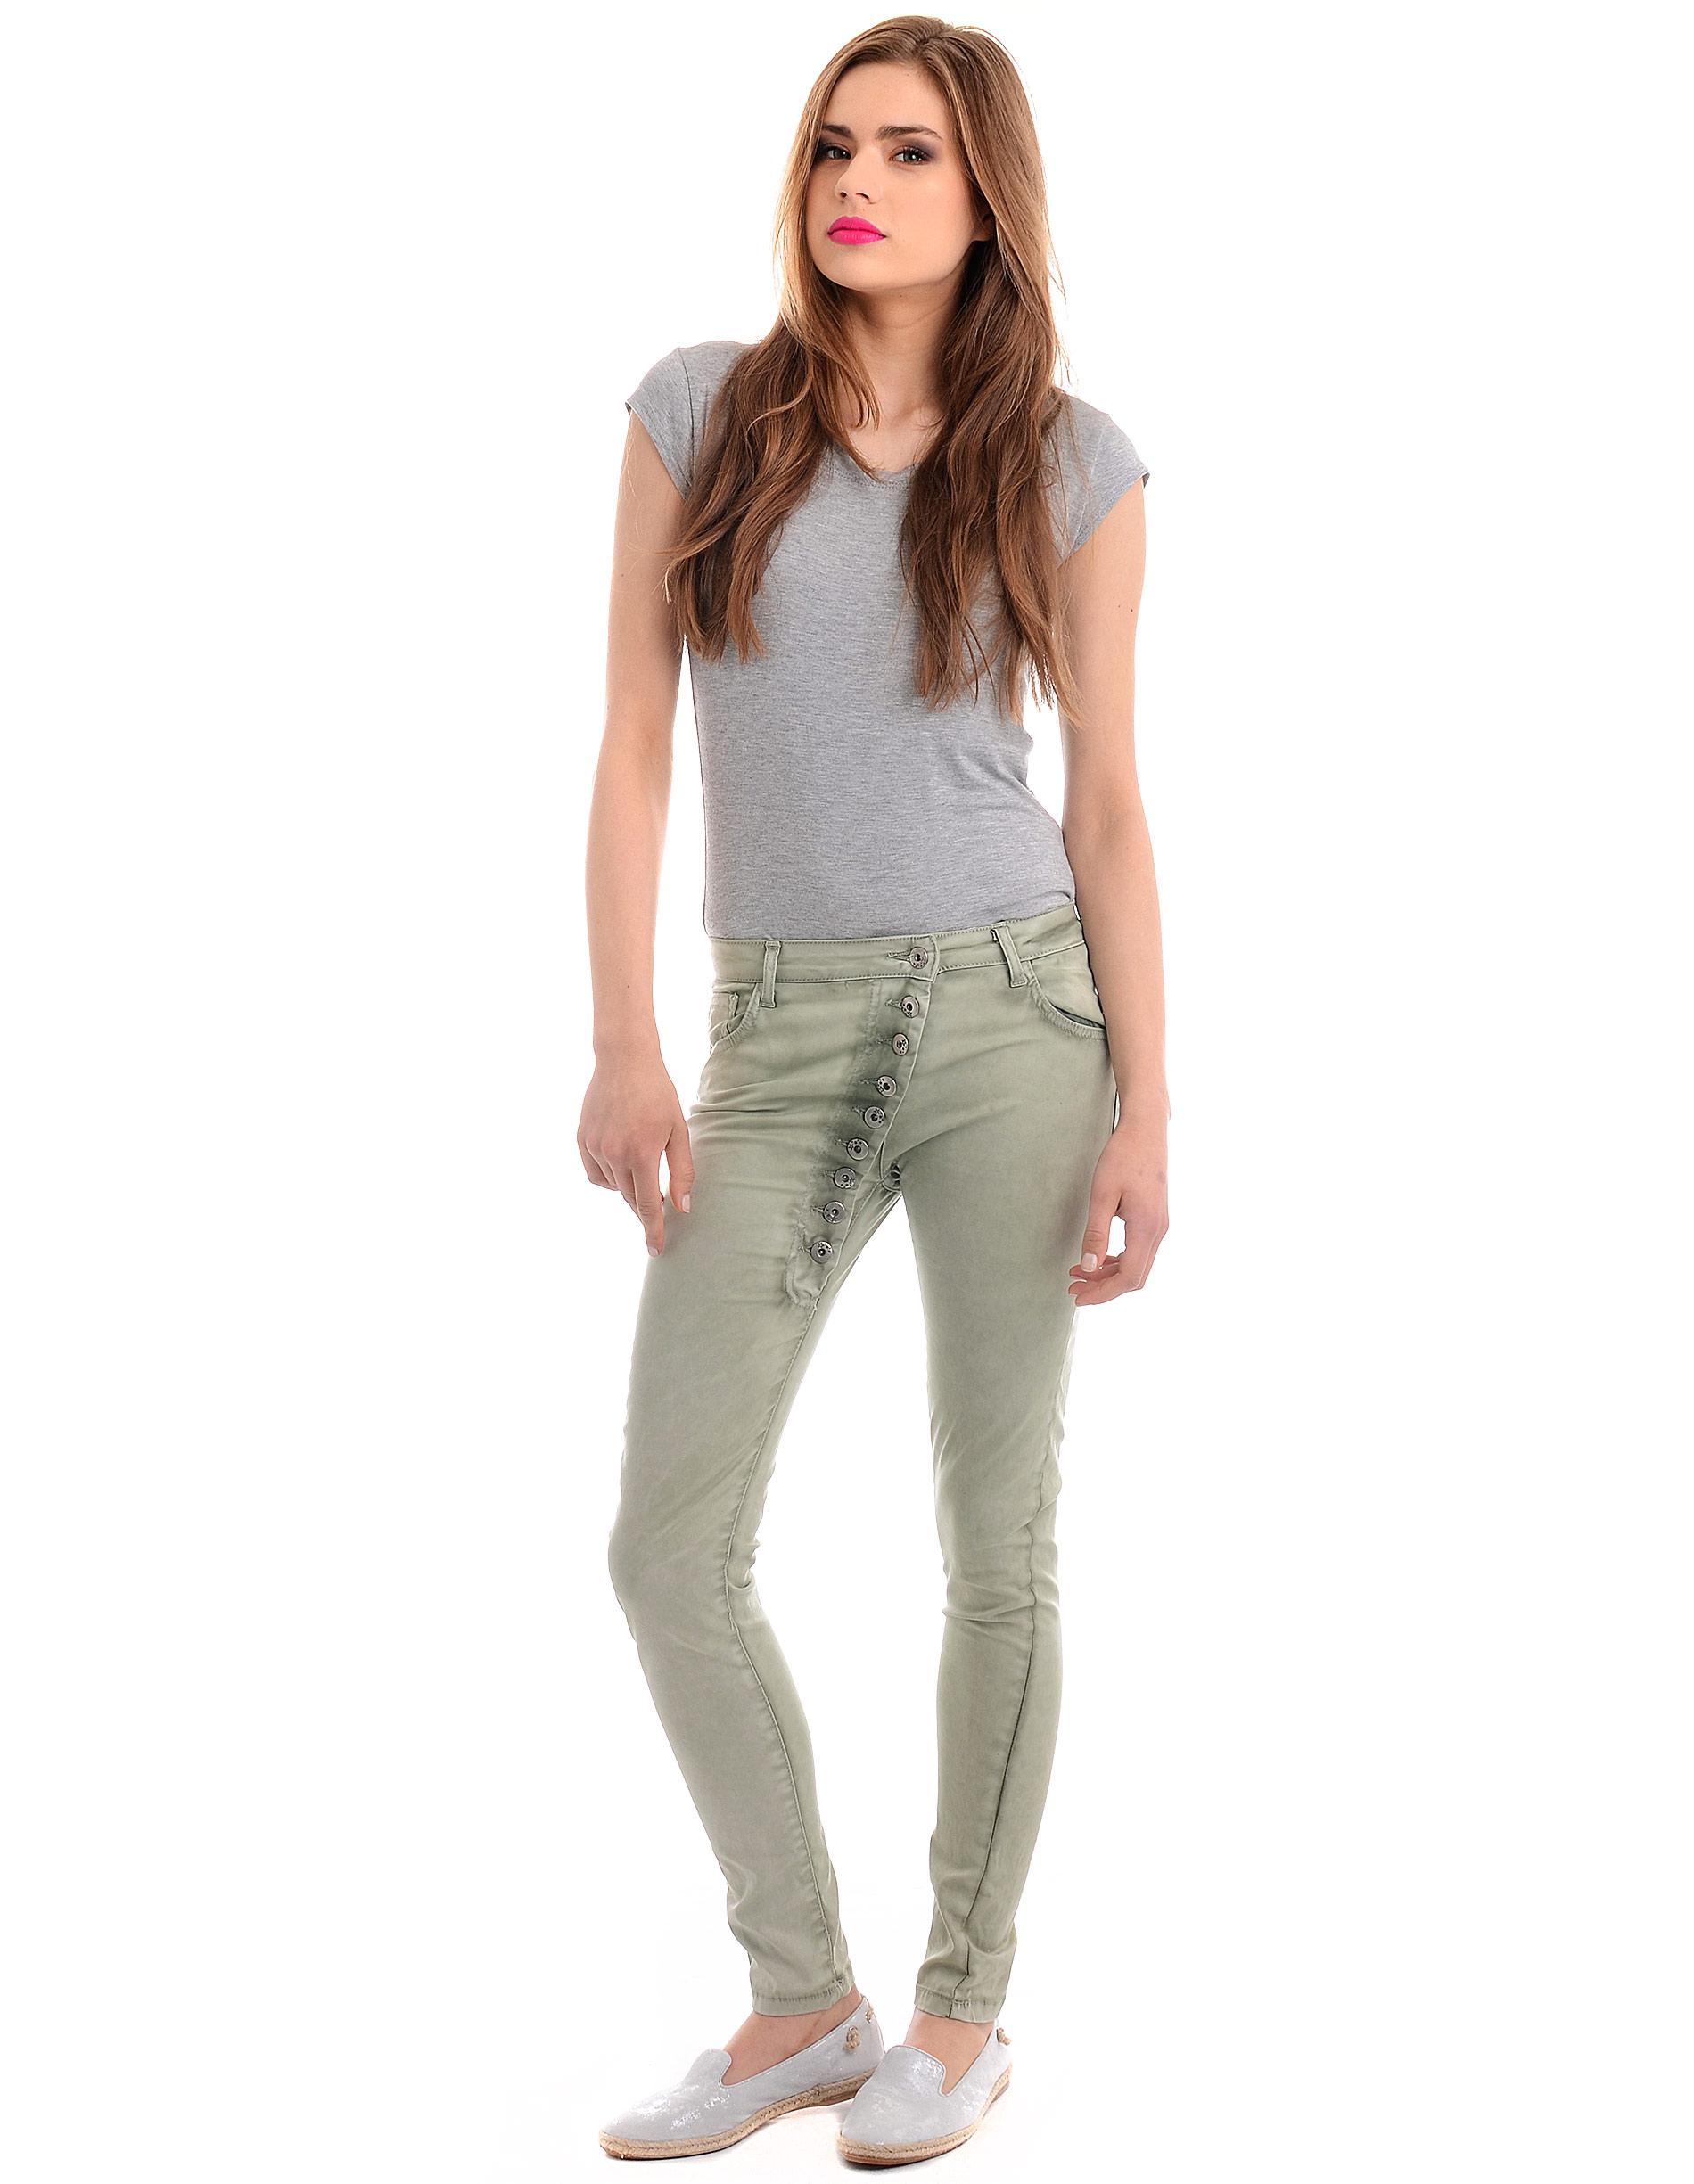 Spodnie - 102-1026 MILI - Unisono